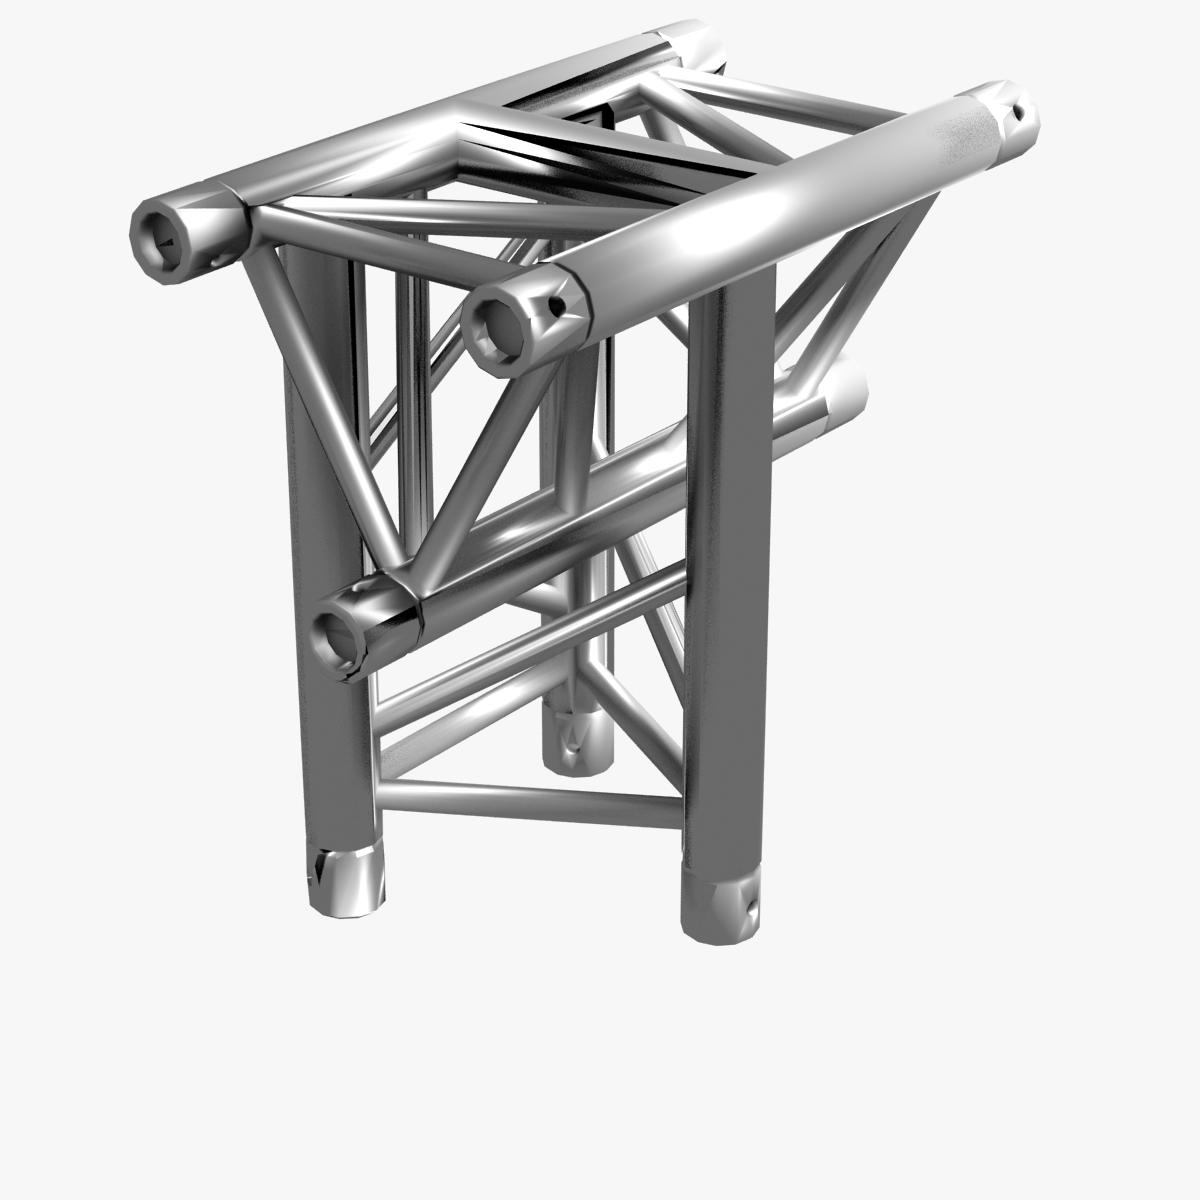 triangular trusses (collection 55 modular pieces) 3d model 3ds max dxf fbx c4d dae texture obj 216217